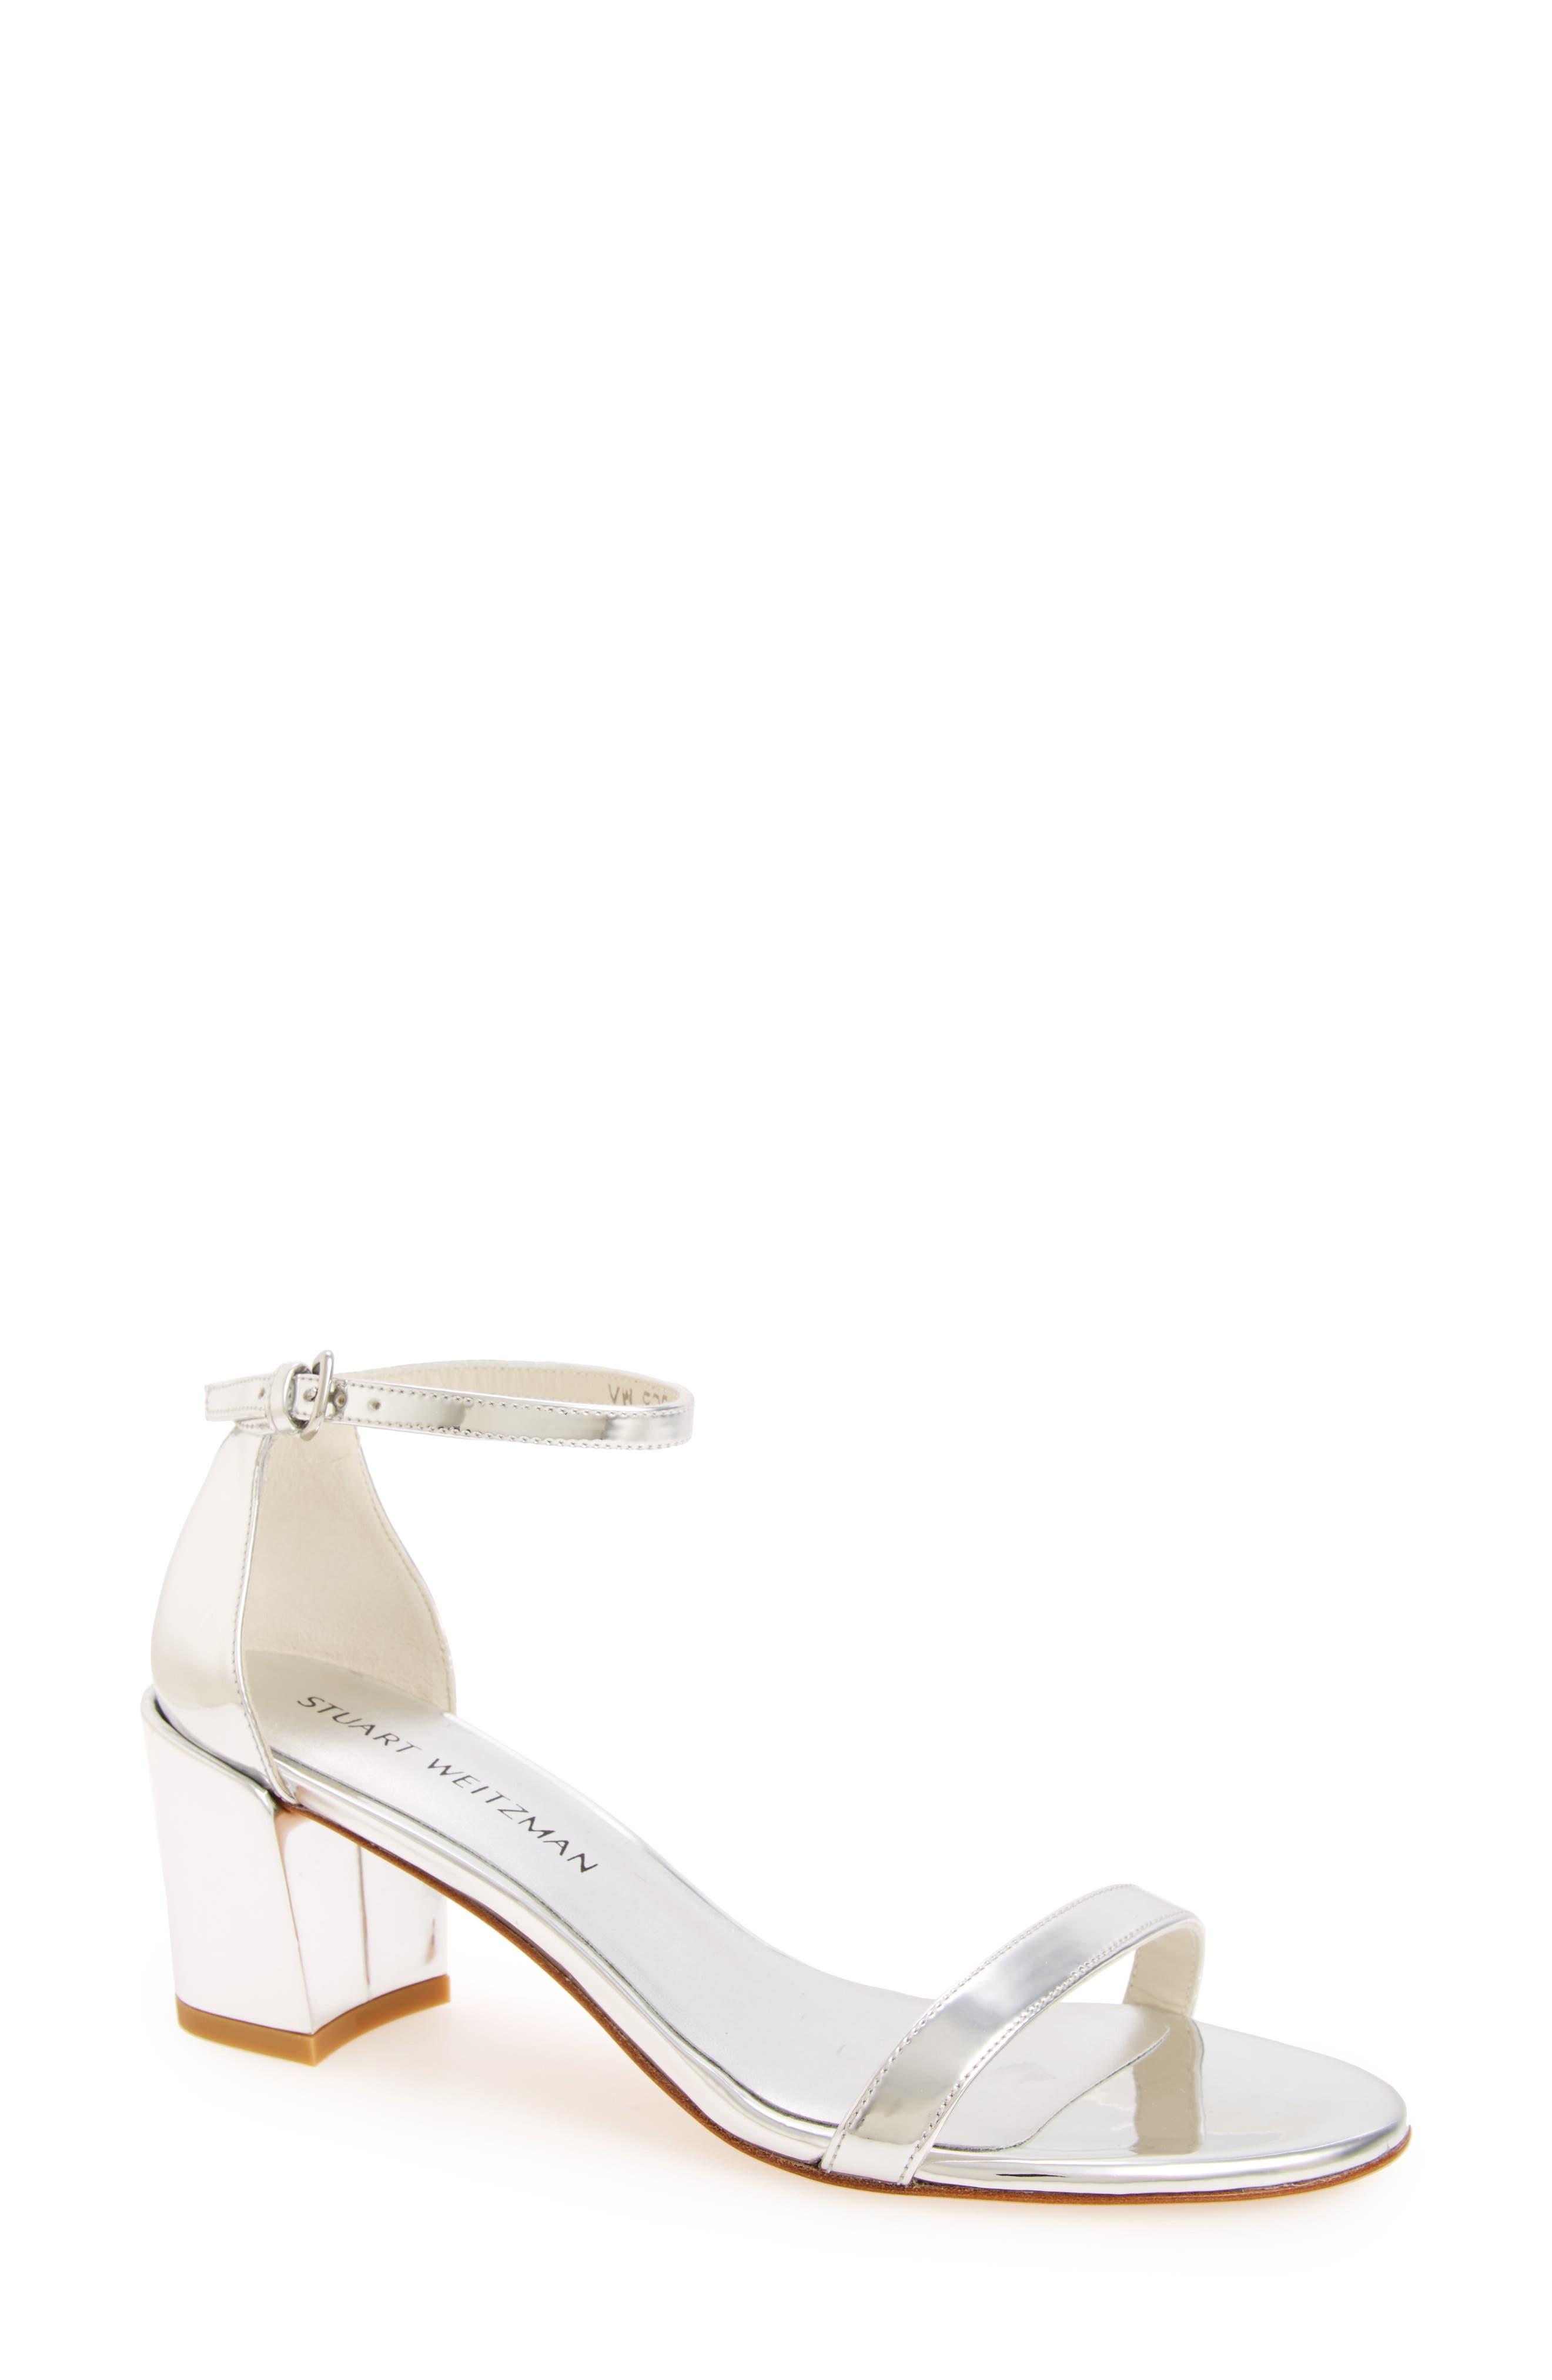 STUART WEITZMAN Simple Ankle Strap Sandal